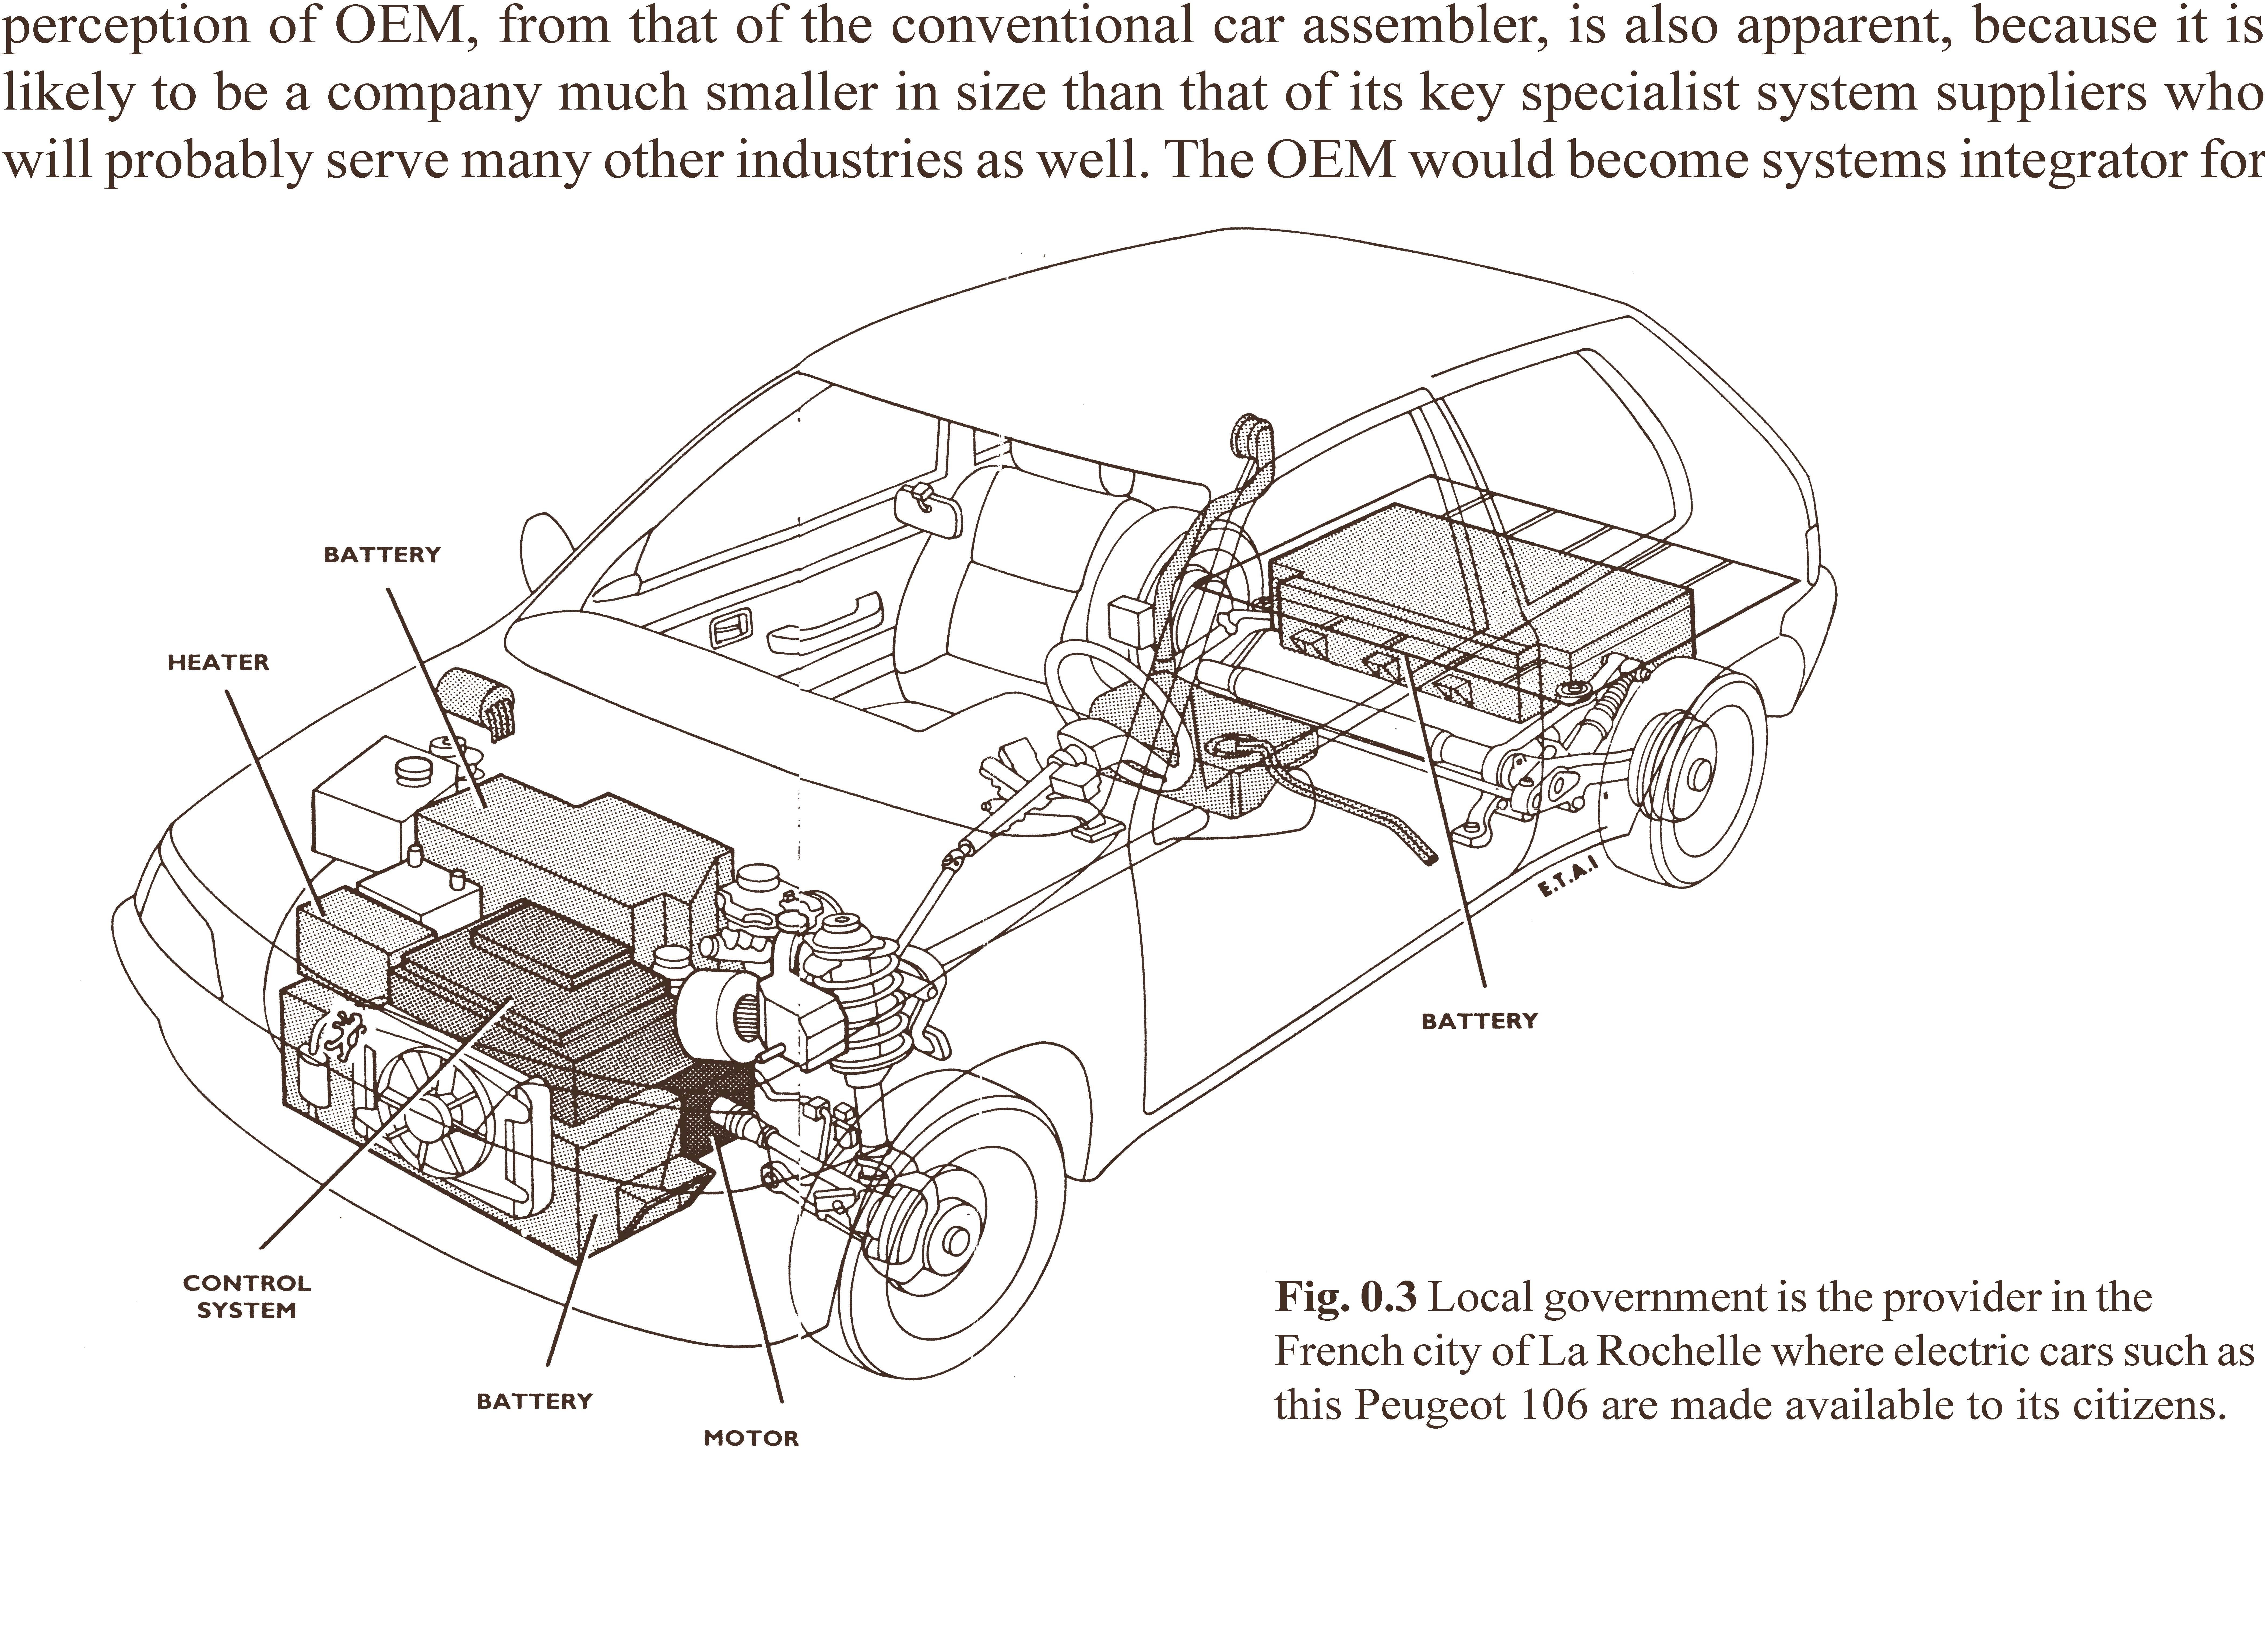 Car Body Panel Diagram Car Electric Vehicle Lightweight Hybrid Ev Design Of Car Body Panel Diagram